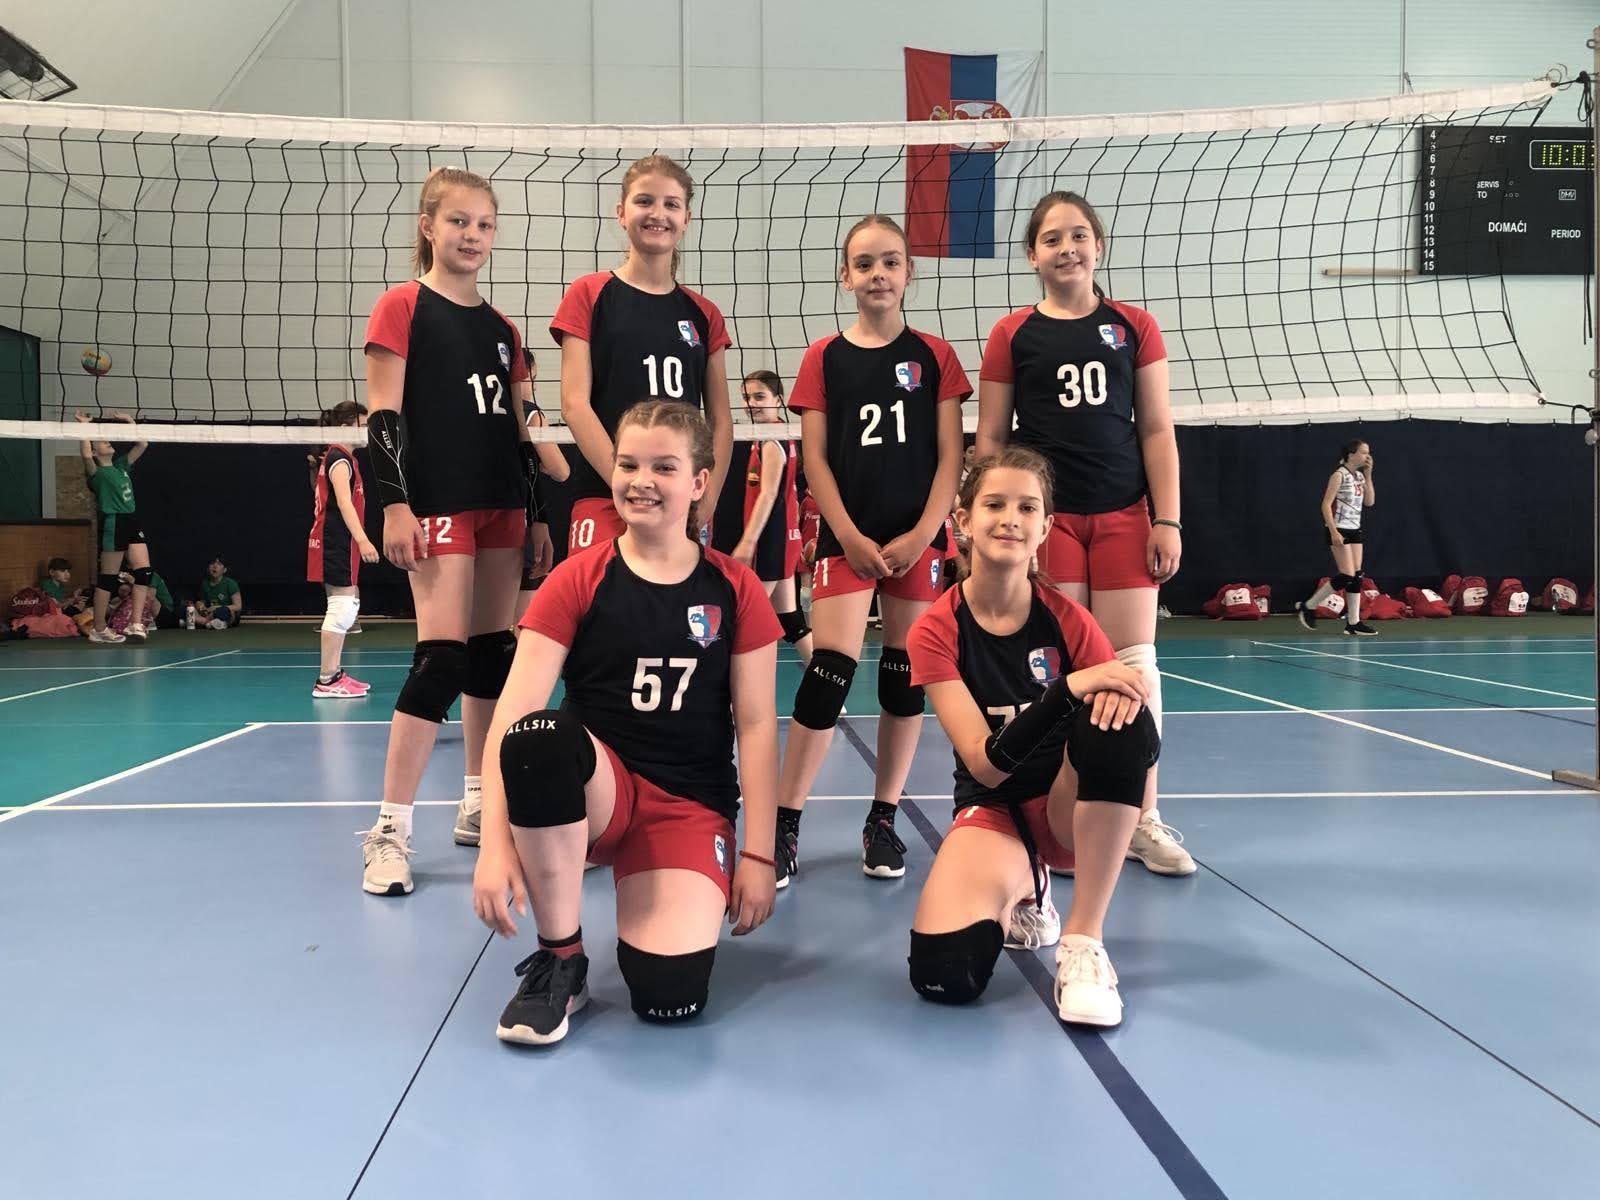 Kapiteni i ekipe | Mini Volley liga | III - IV kolo | sezona | 2020/2021 - 10